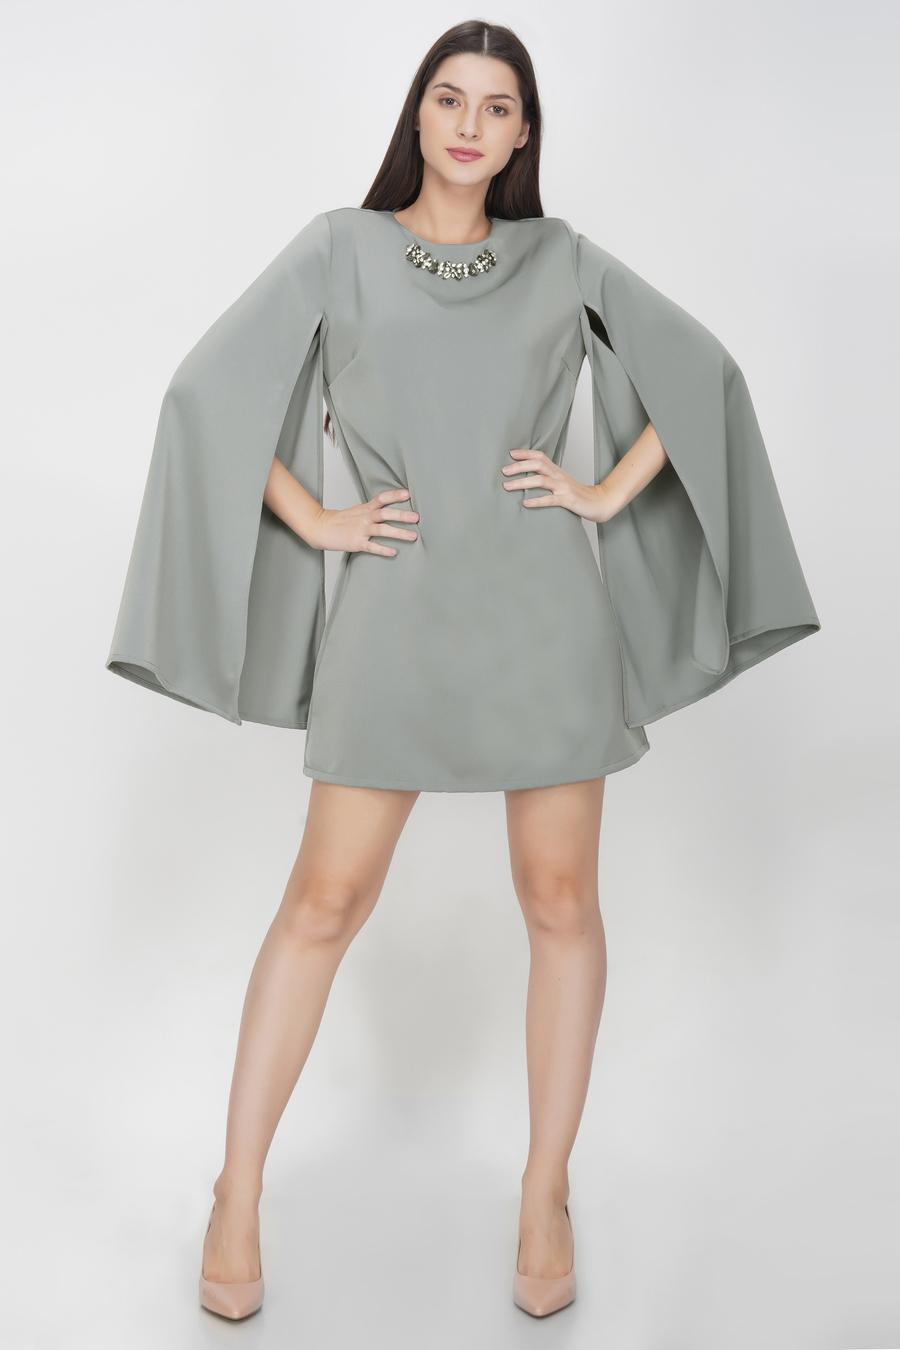 Light Grey Slit Sleeves Dress